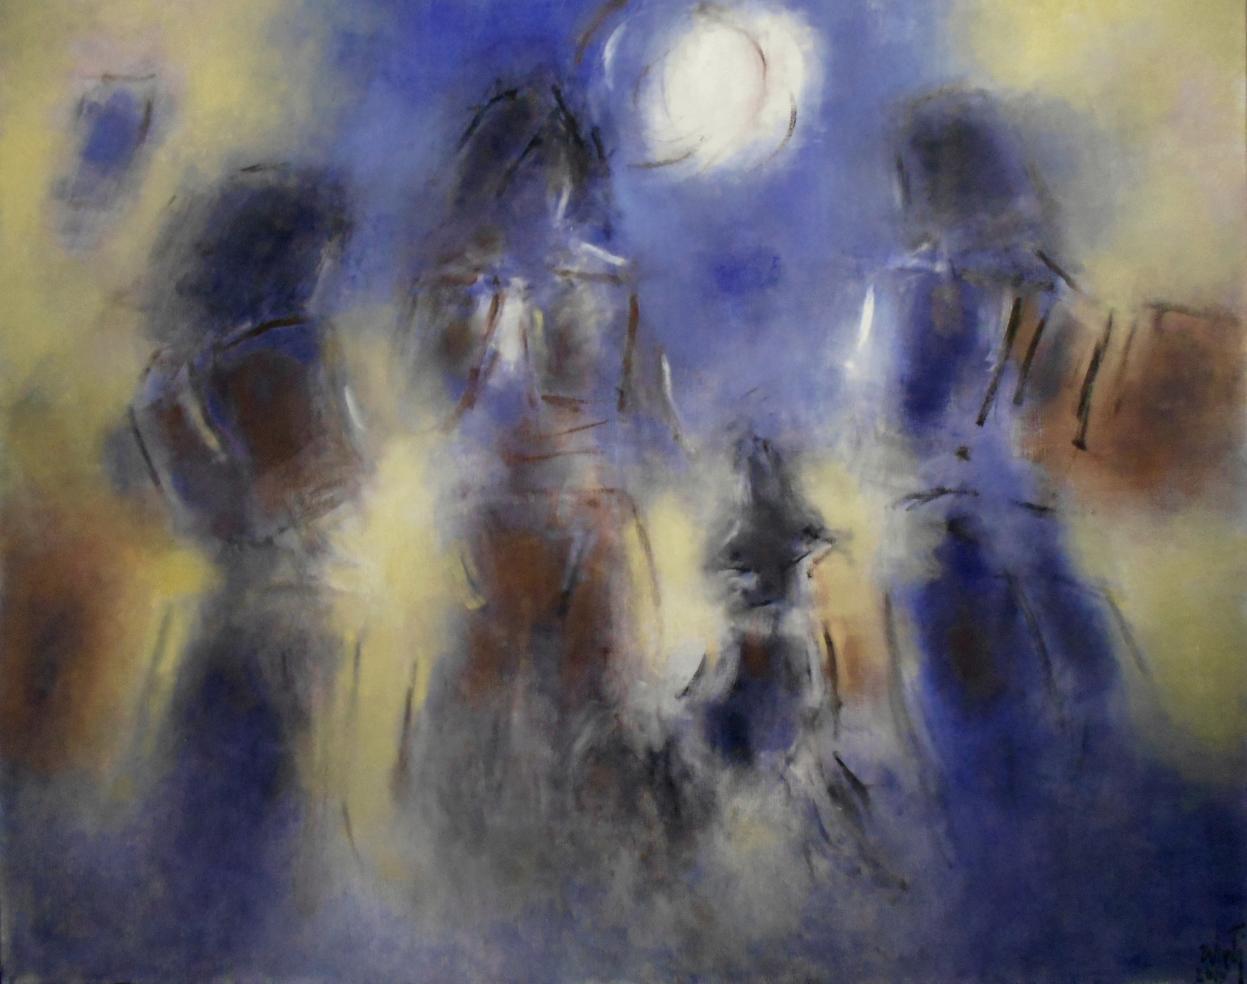 Luna-óleo sobre tela (2019) - Luis Zilveti